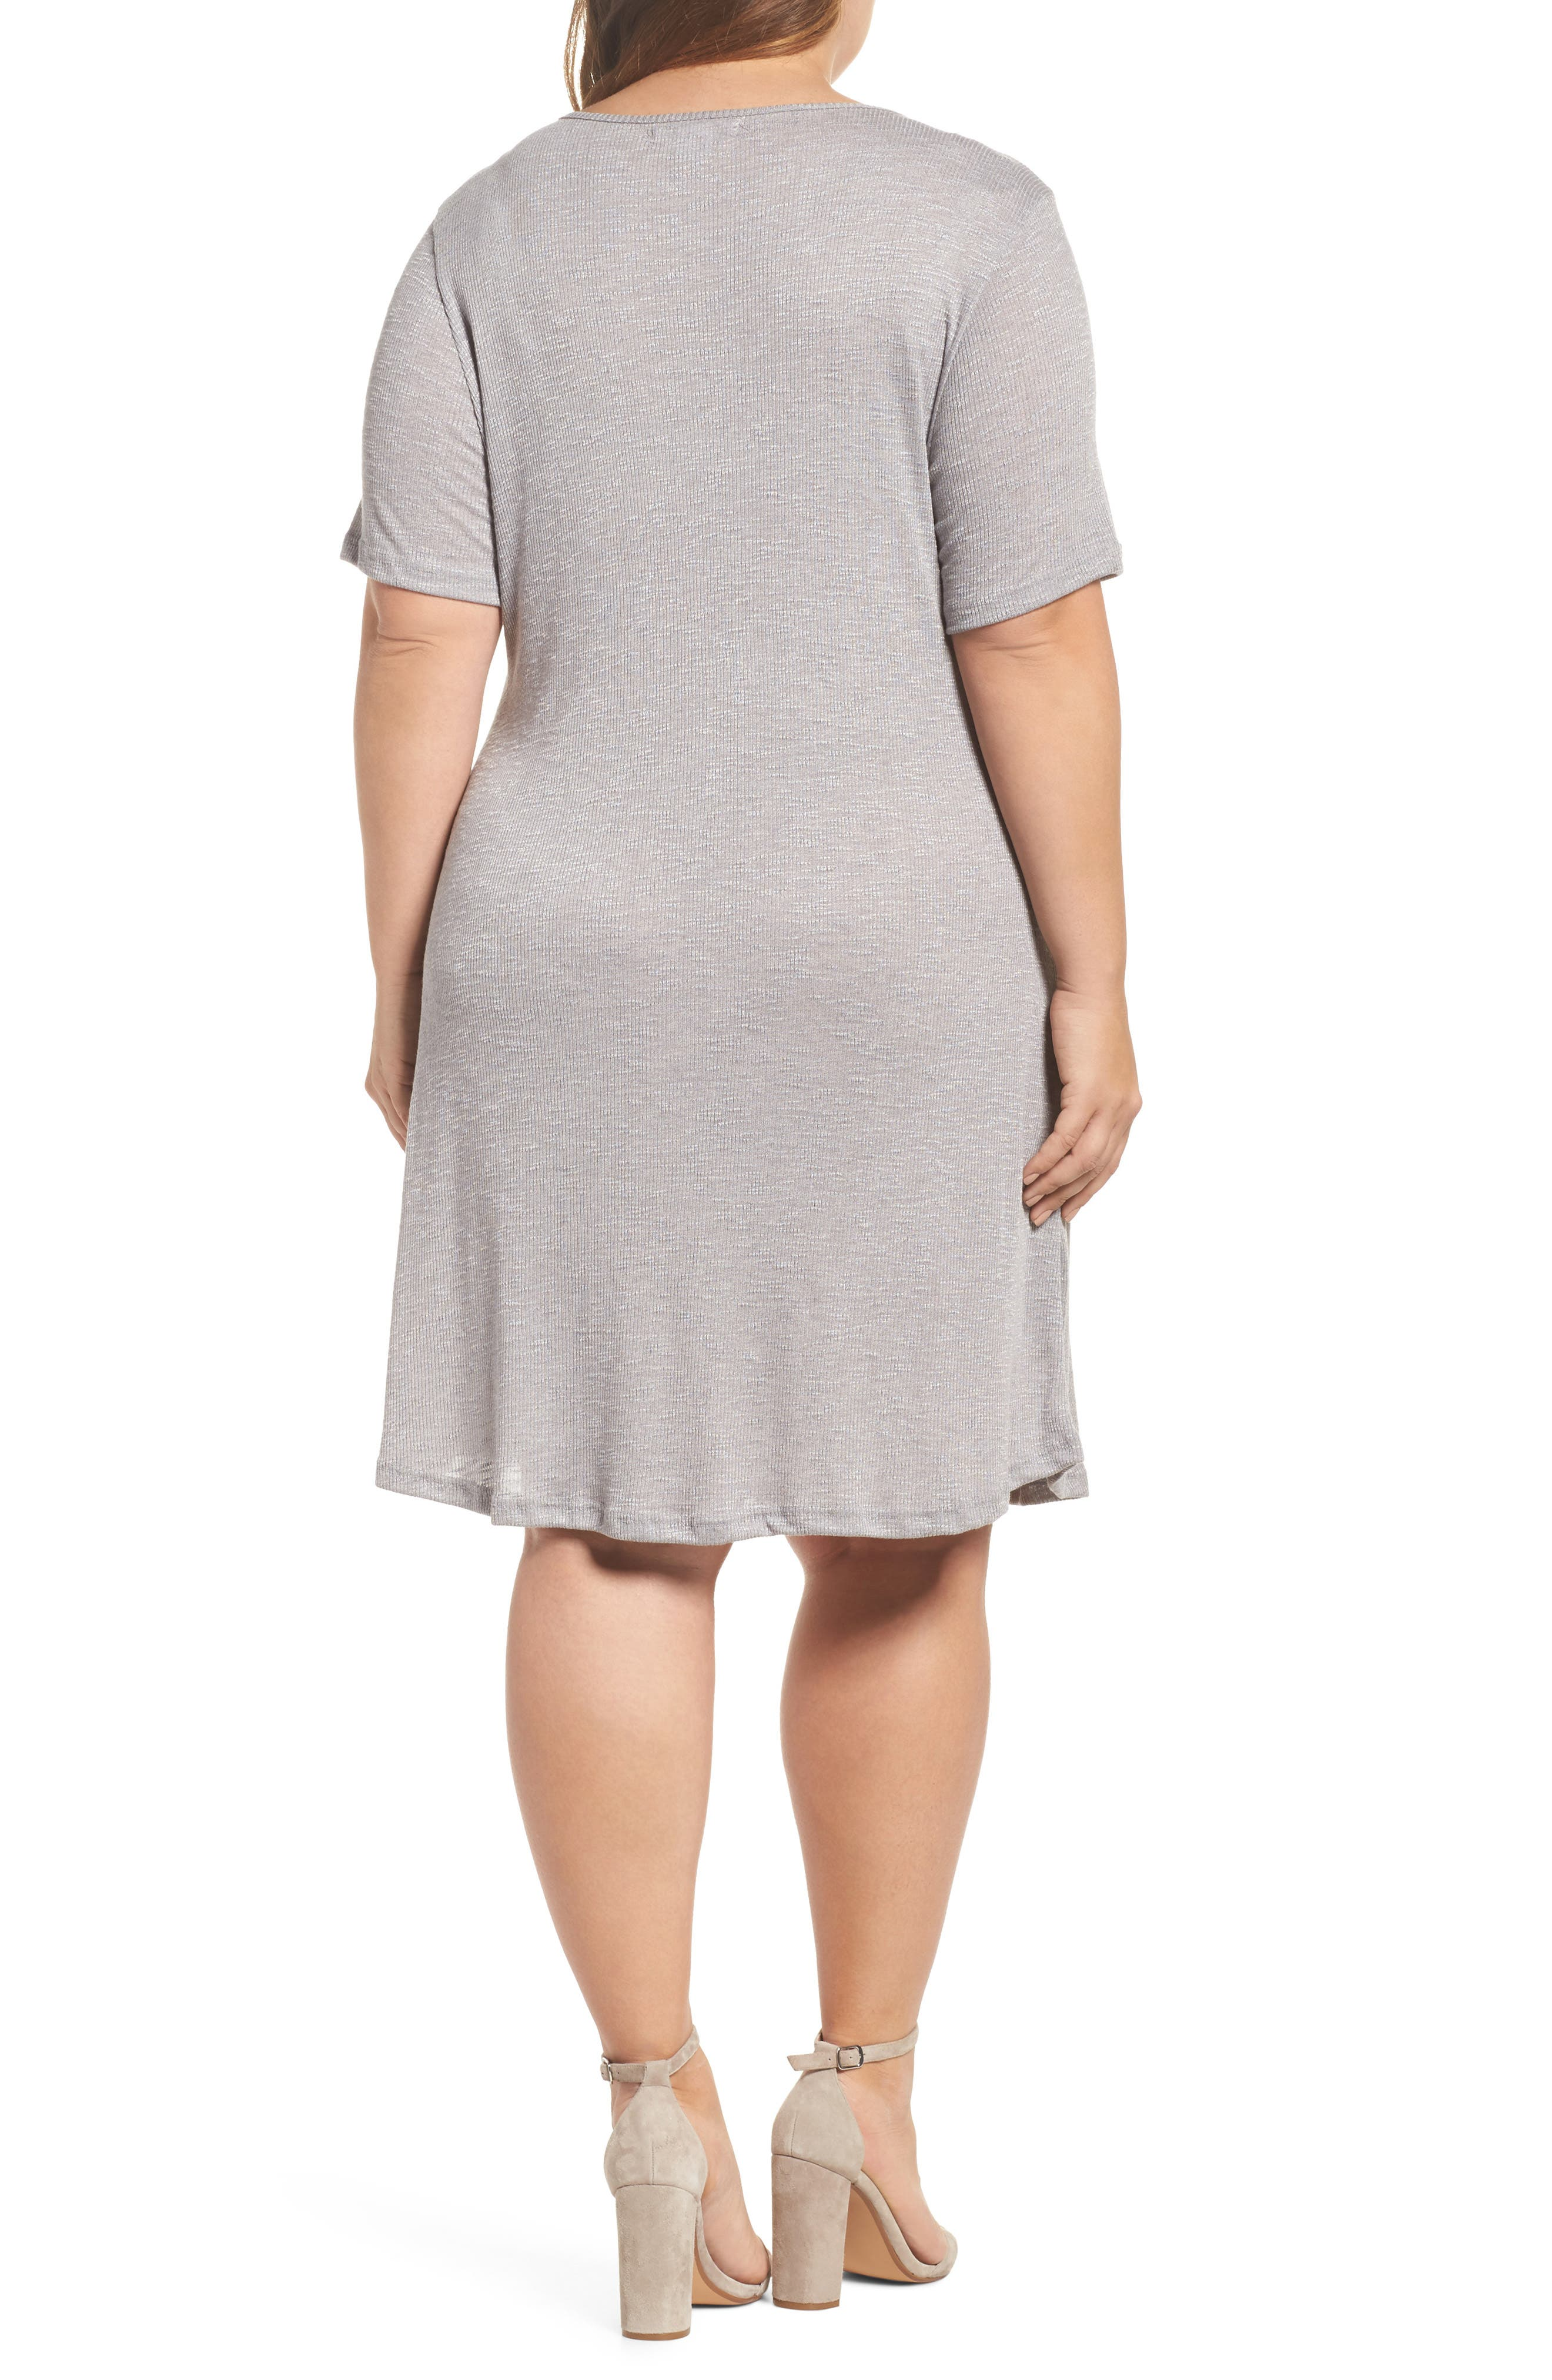 Lace-Up Knit Shift Dress,                             Alternate thumbnail 2, color,                             020